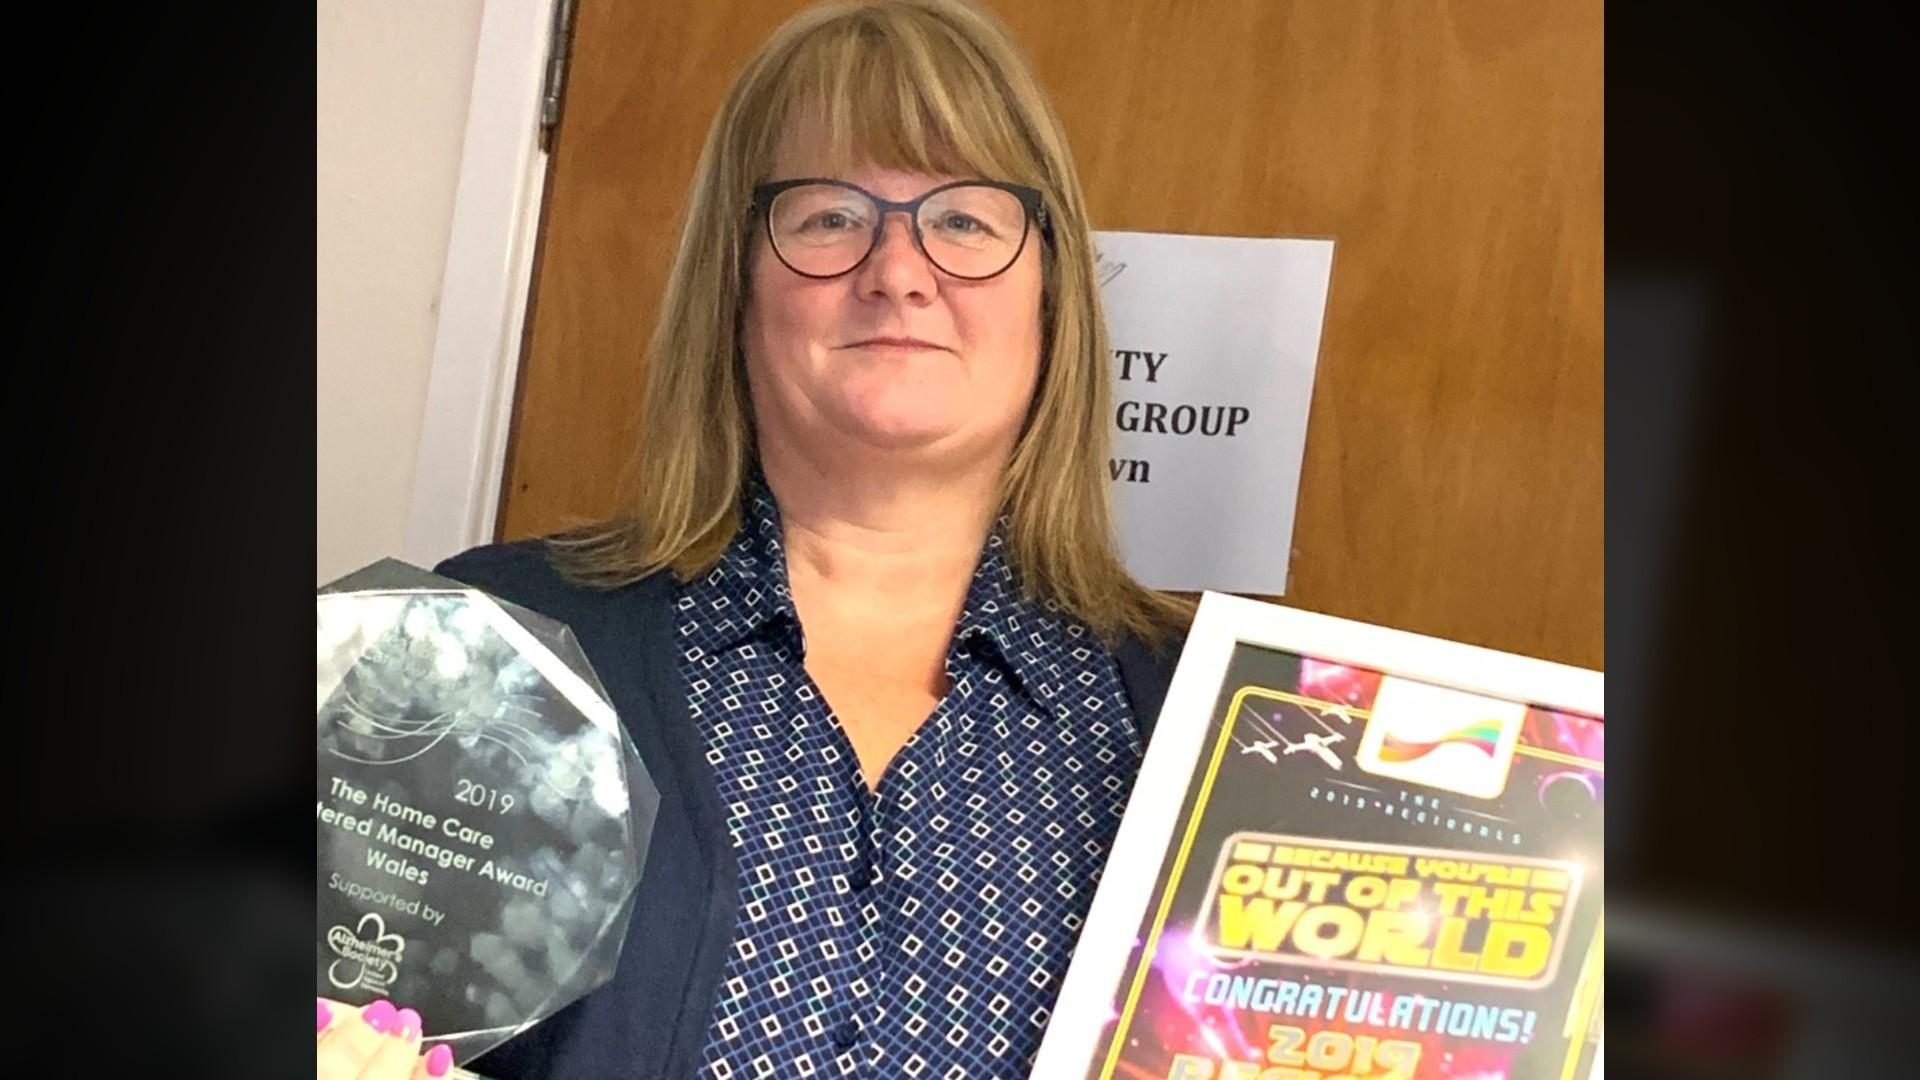 Care provider up for major award